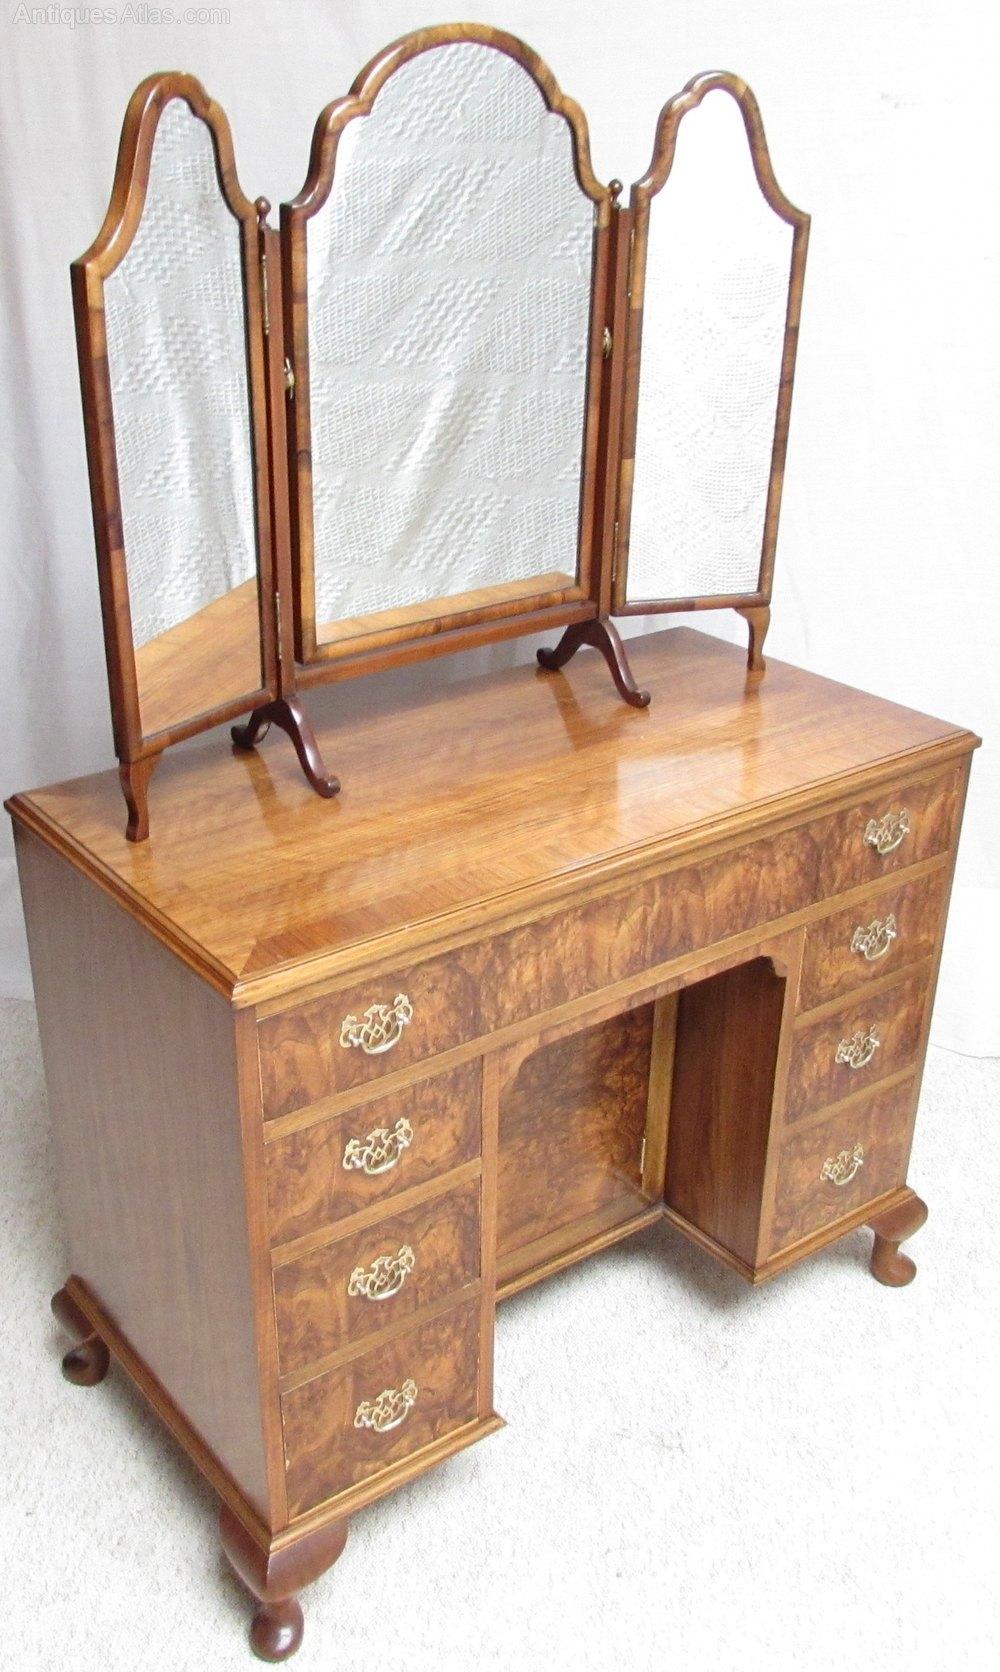 Superb burr walnut dressing table antiques atlas for Walnut dressing table